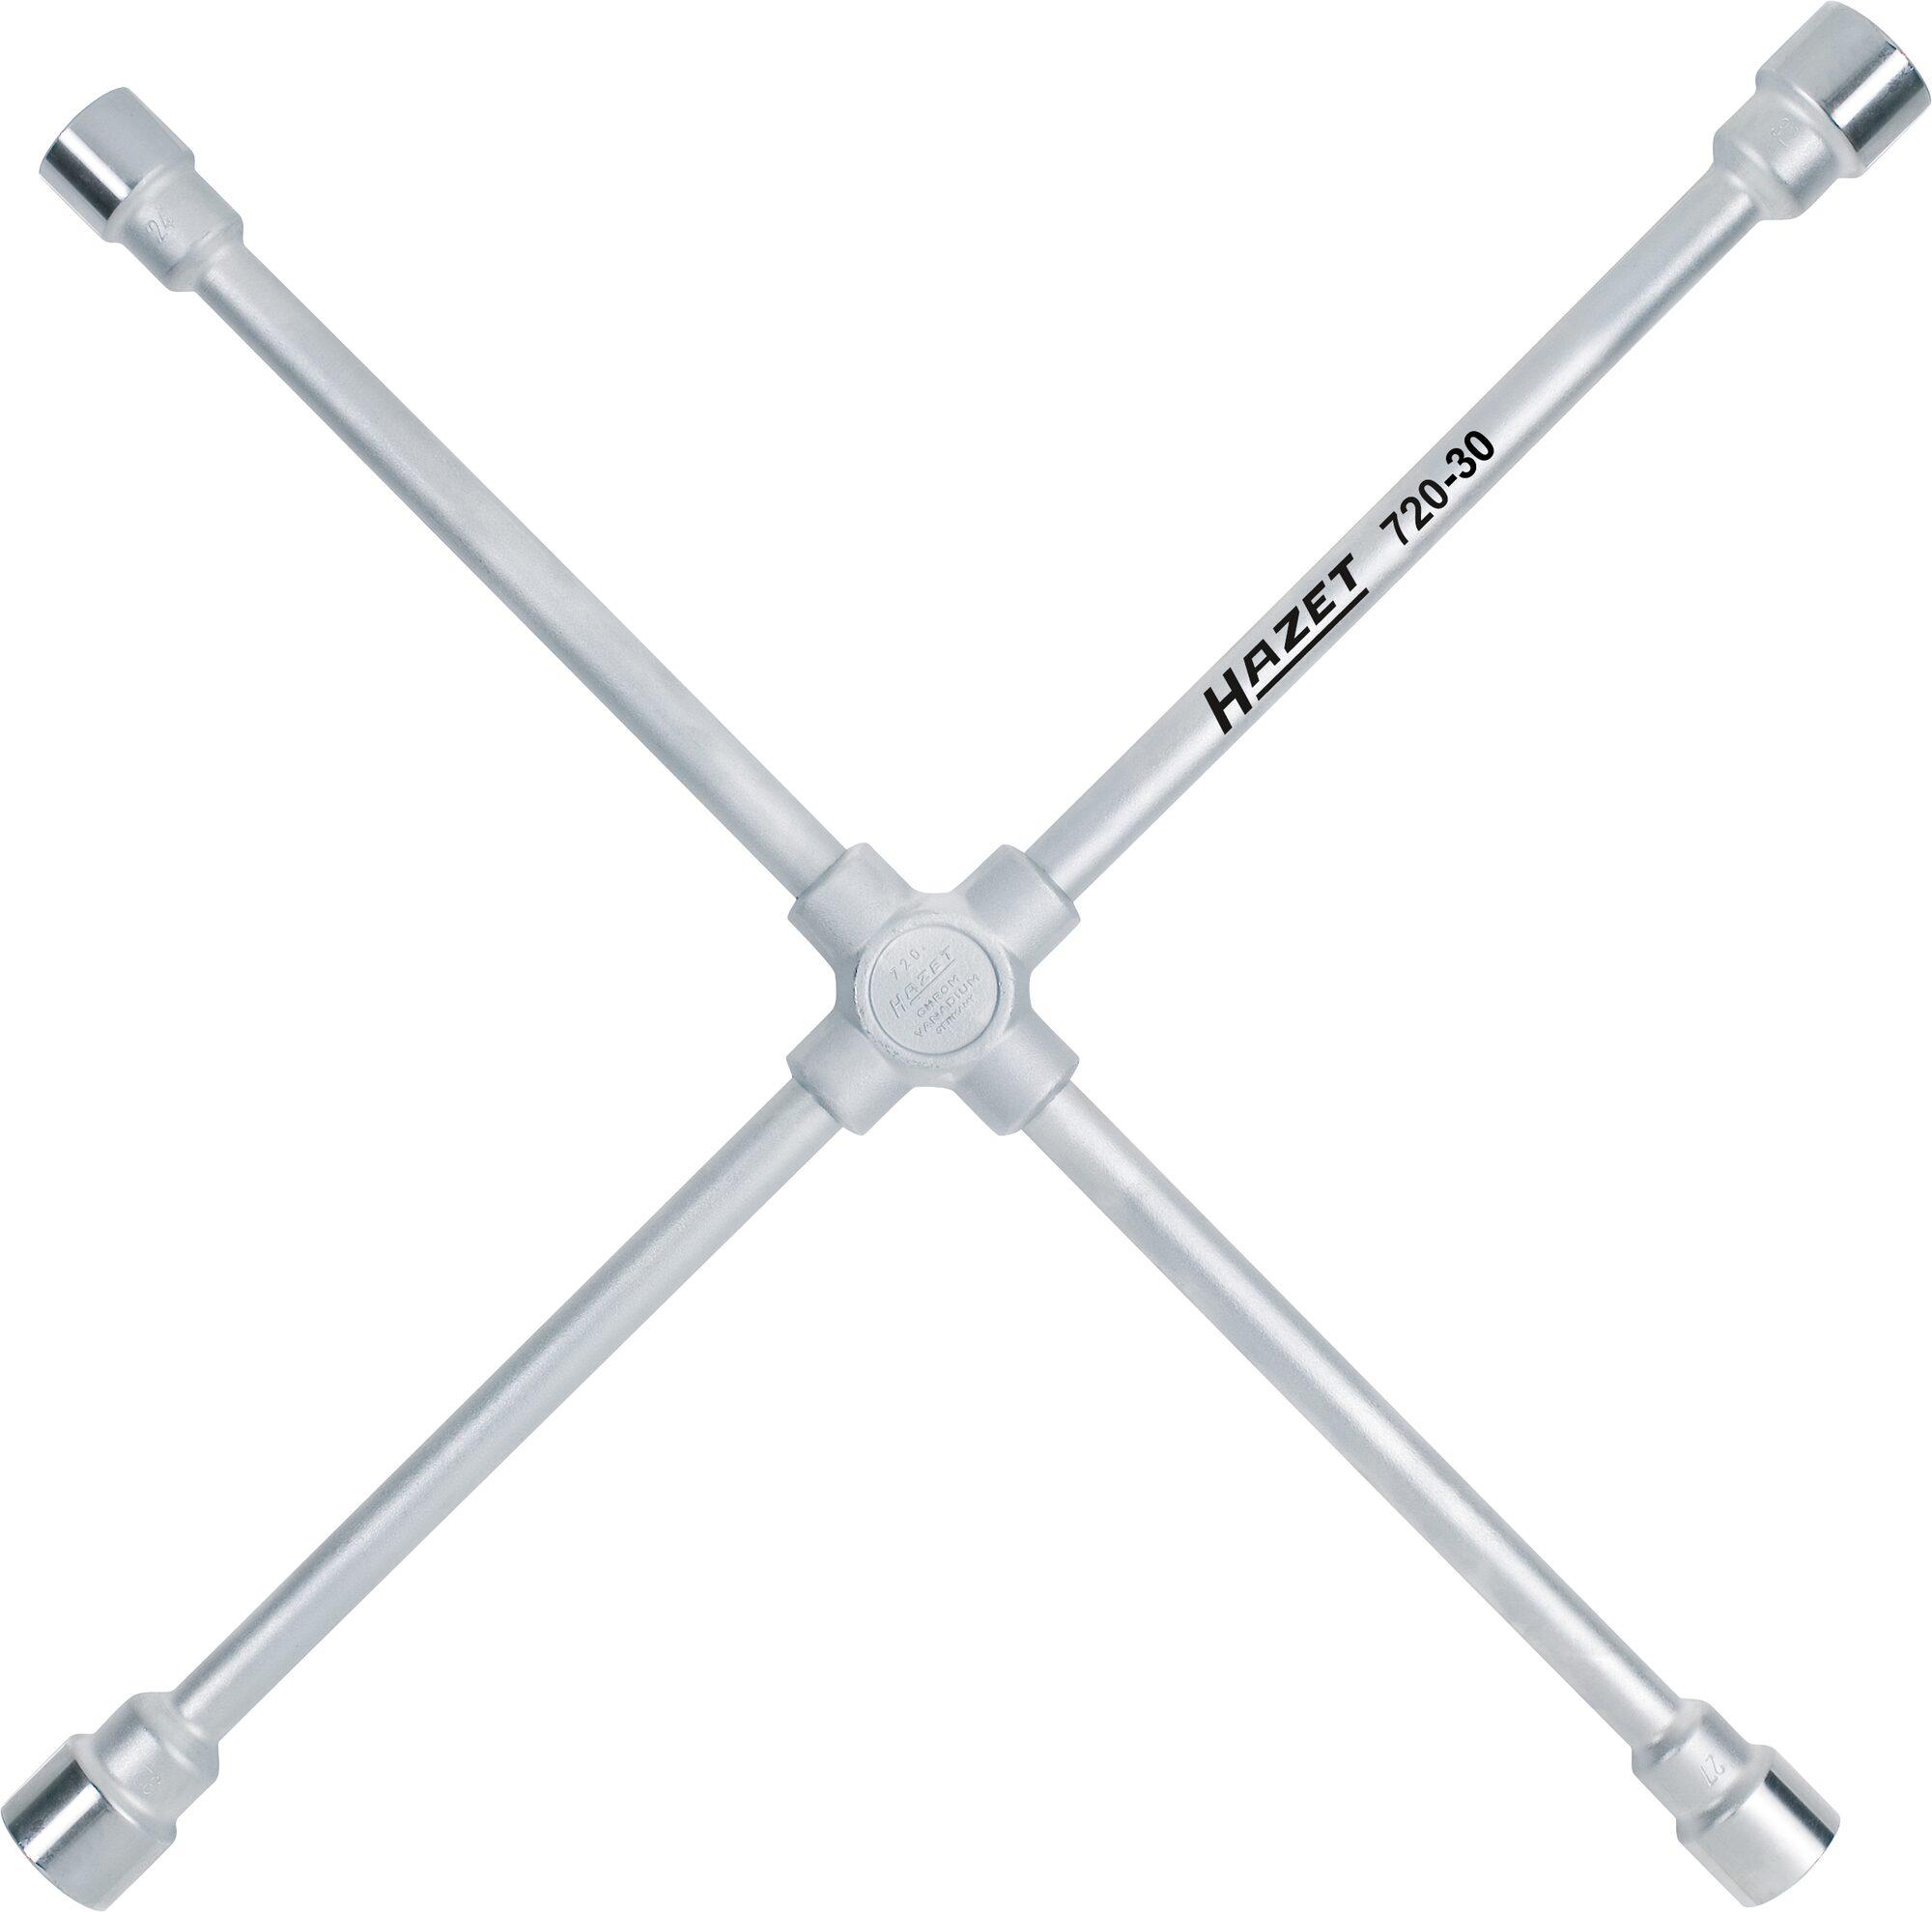 HAZET Kreuzschlüssel 720-30 ∙ Außen-Sechskant Profil ∙ 24x27x30x32 mm